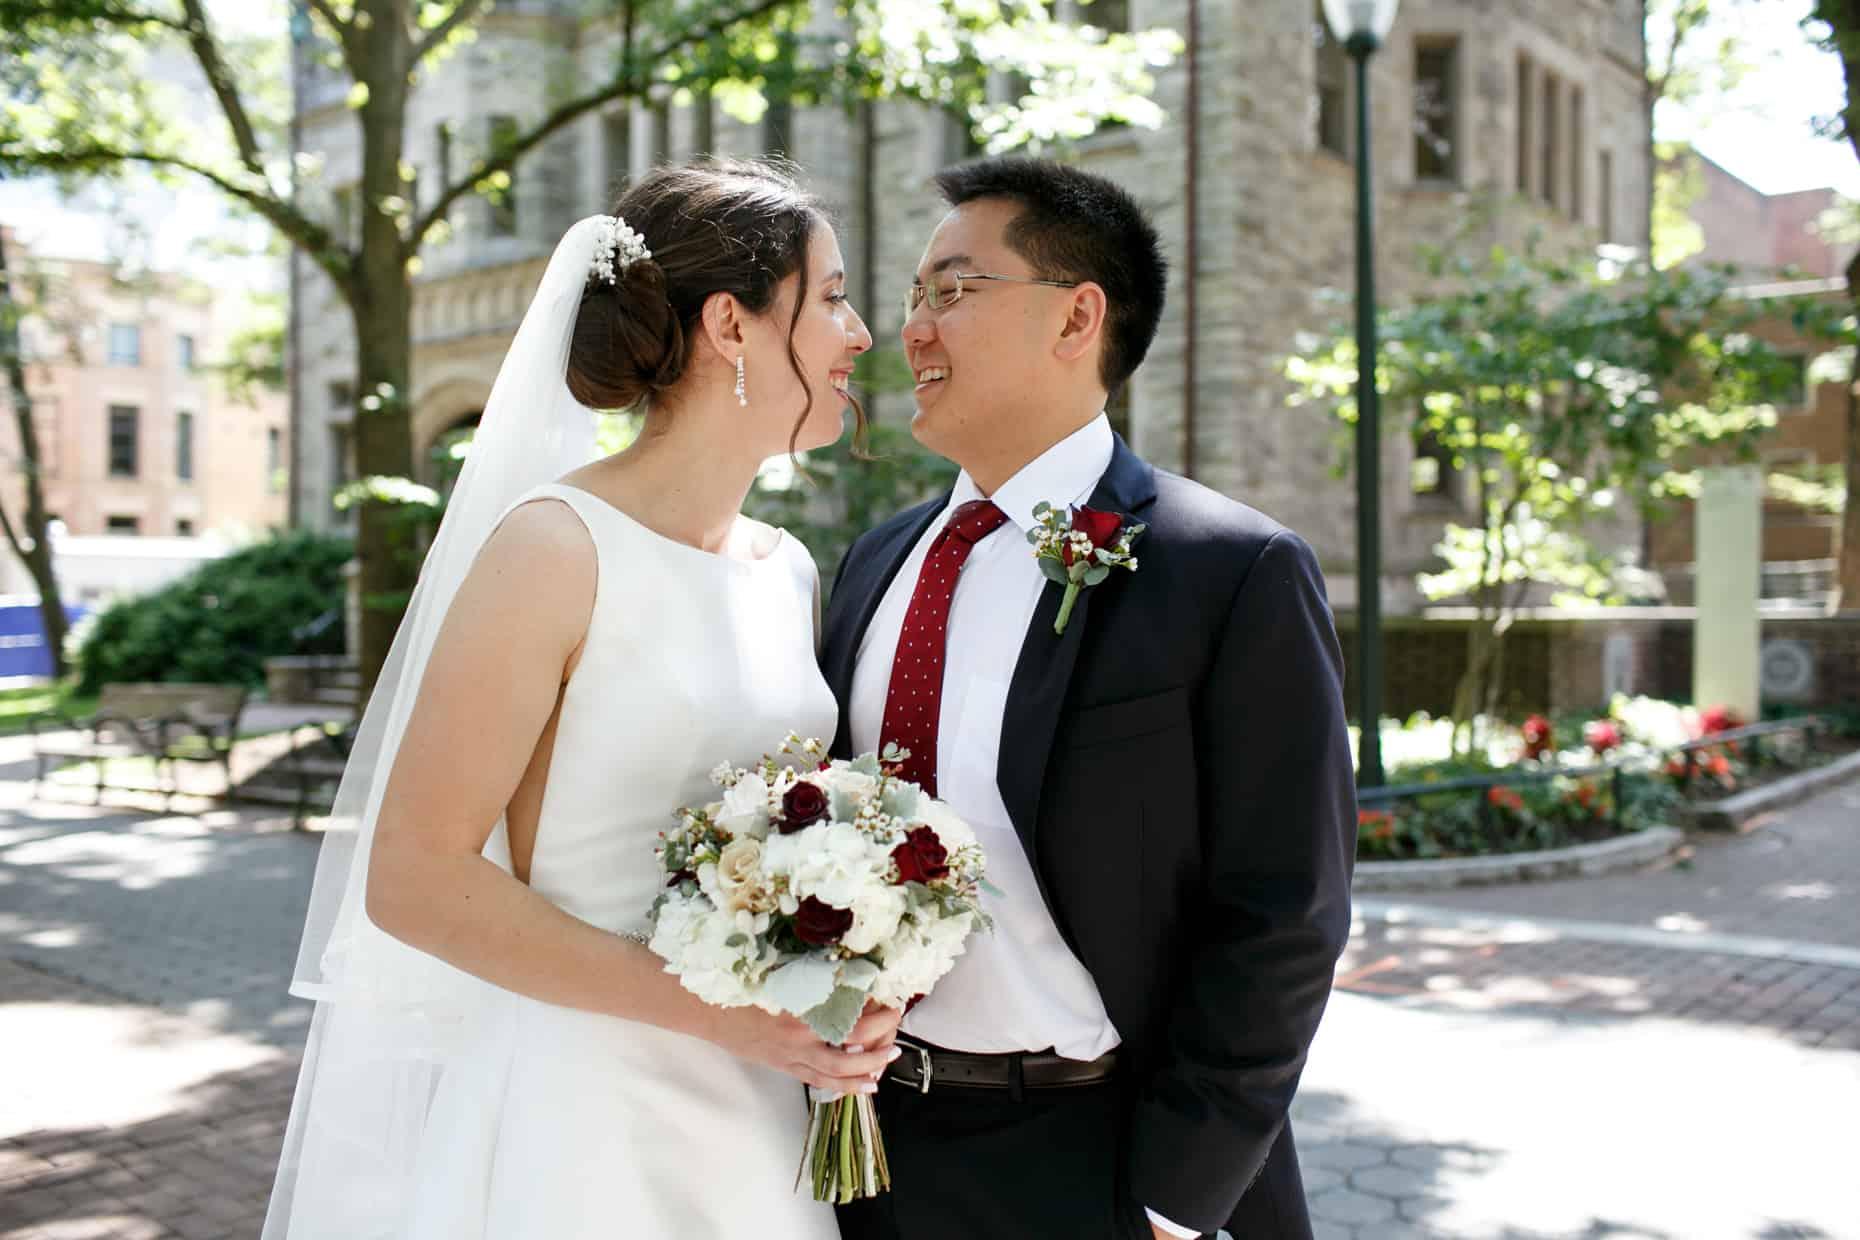 University of Penn Wedding Photos